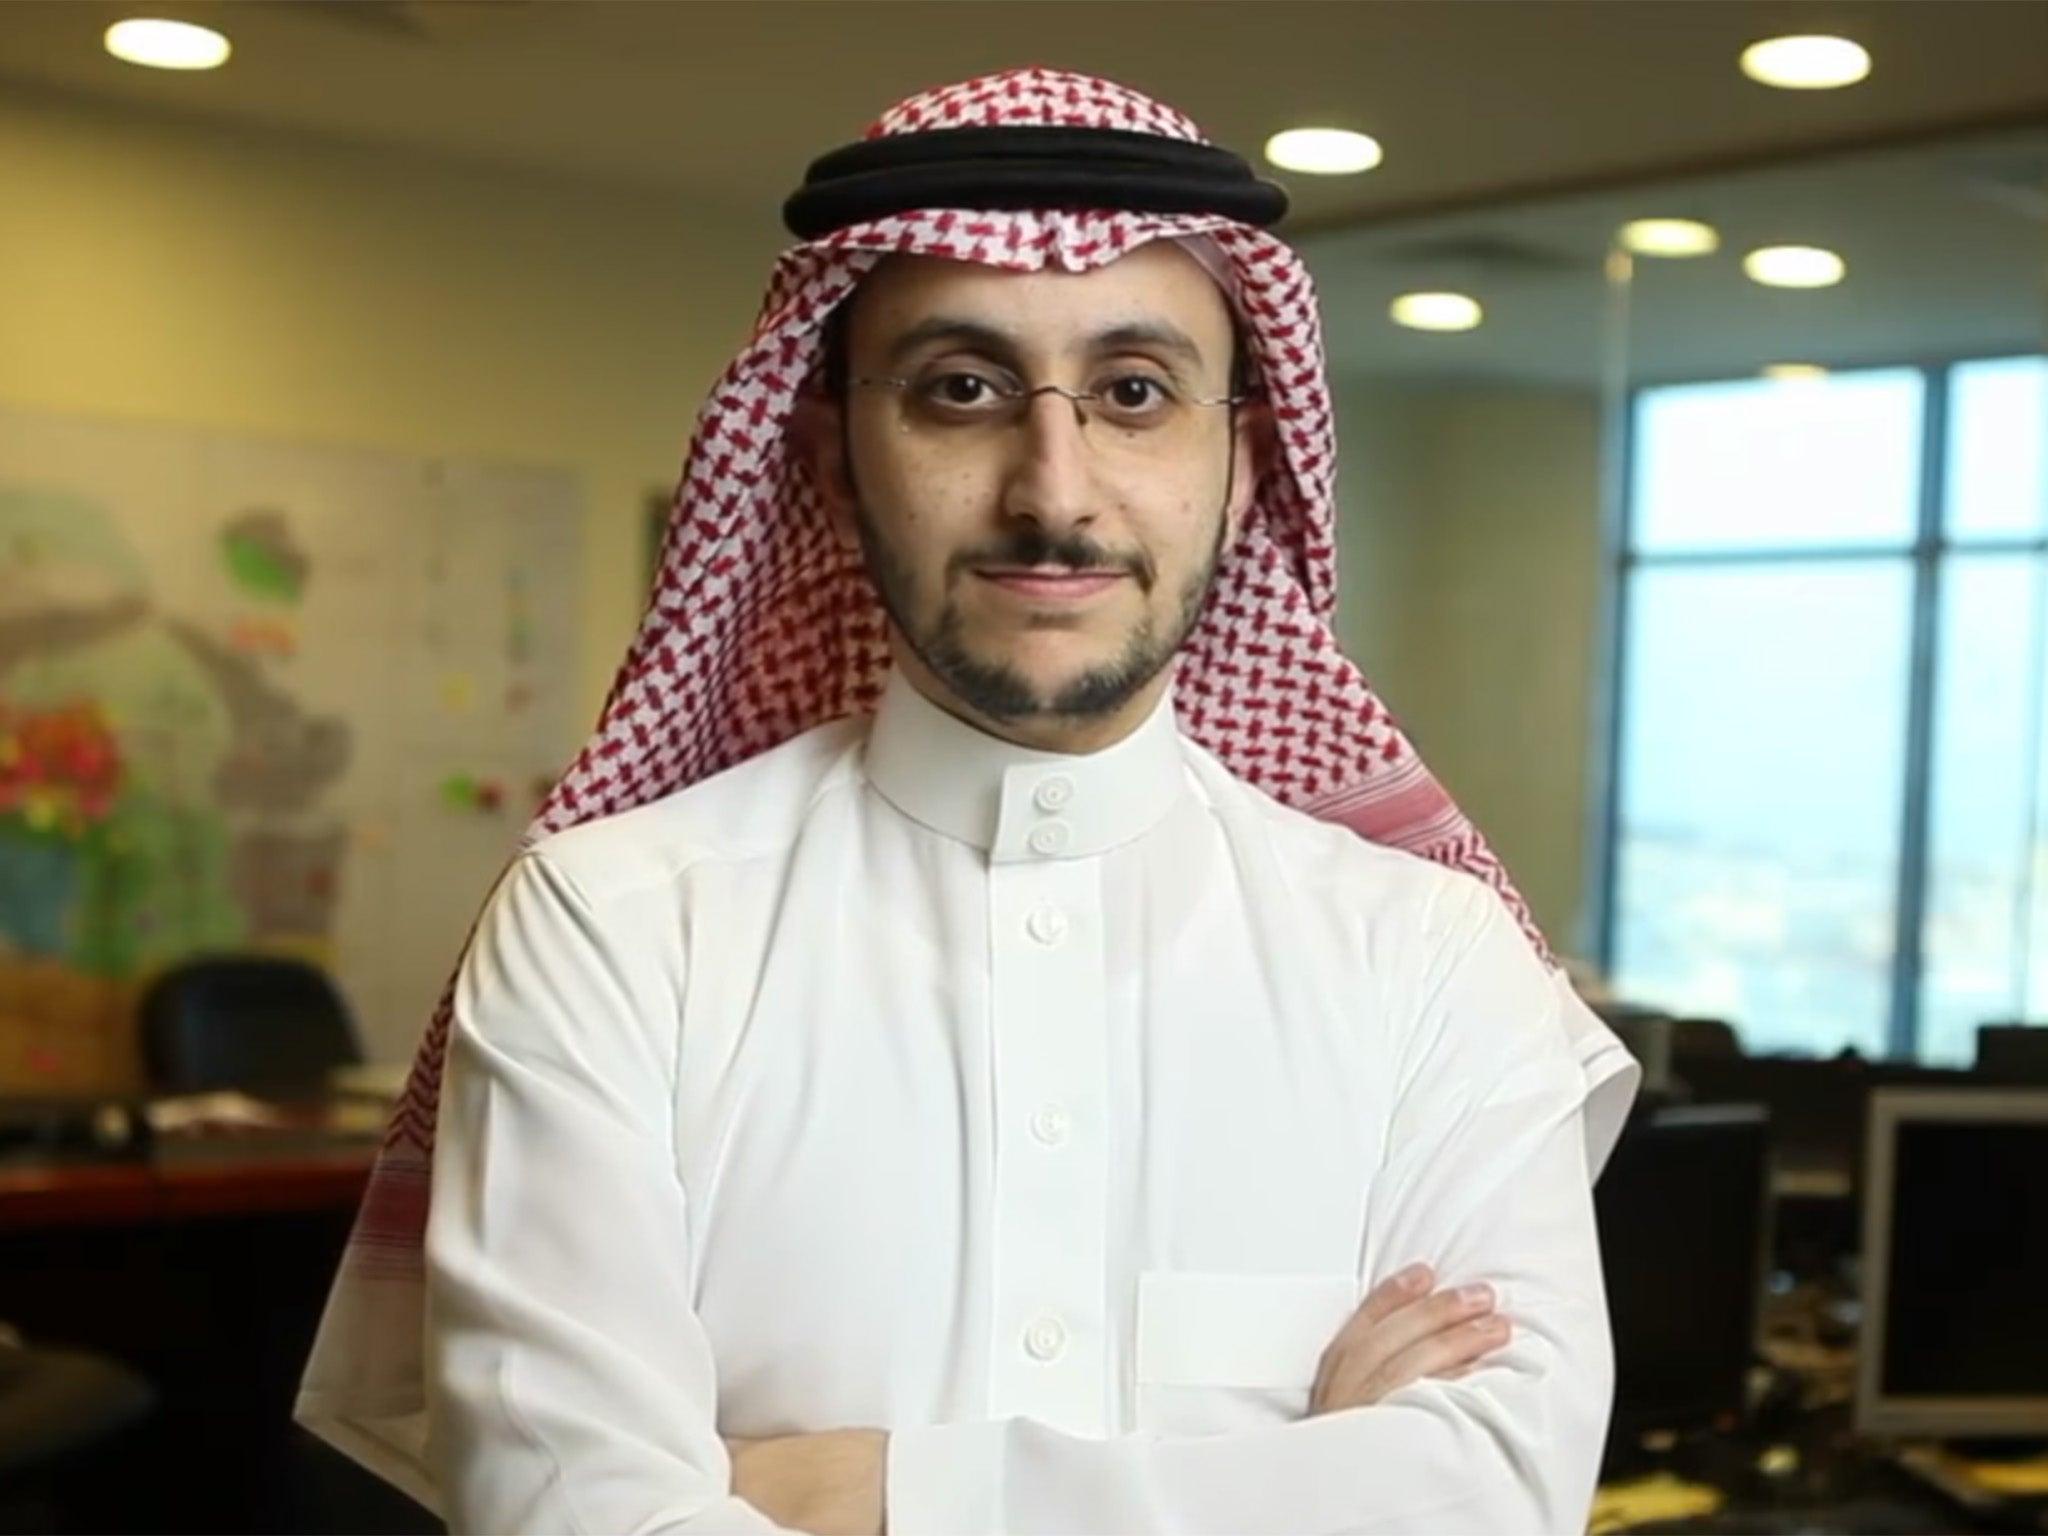 Saudi Arabia arrests economist on terror charges after he criticises Crown Prince Mohammed Bin Salman's financial plans